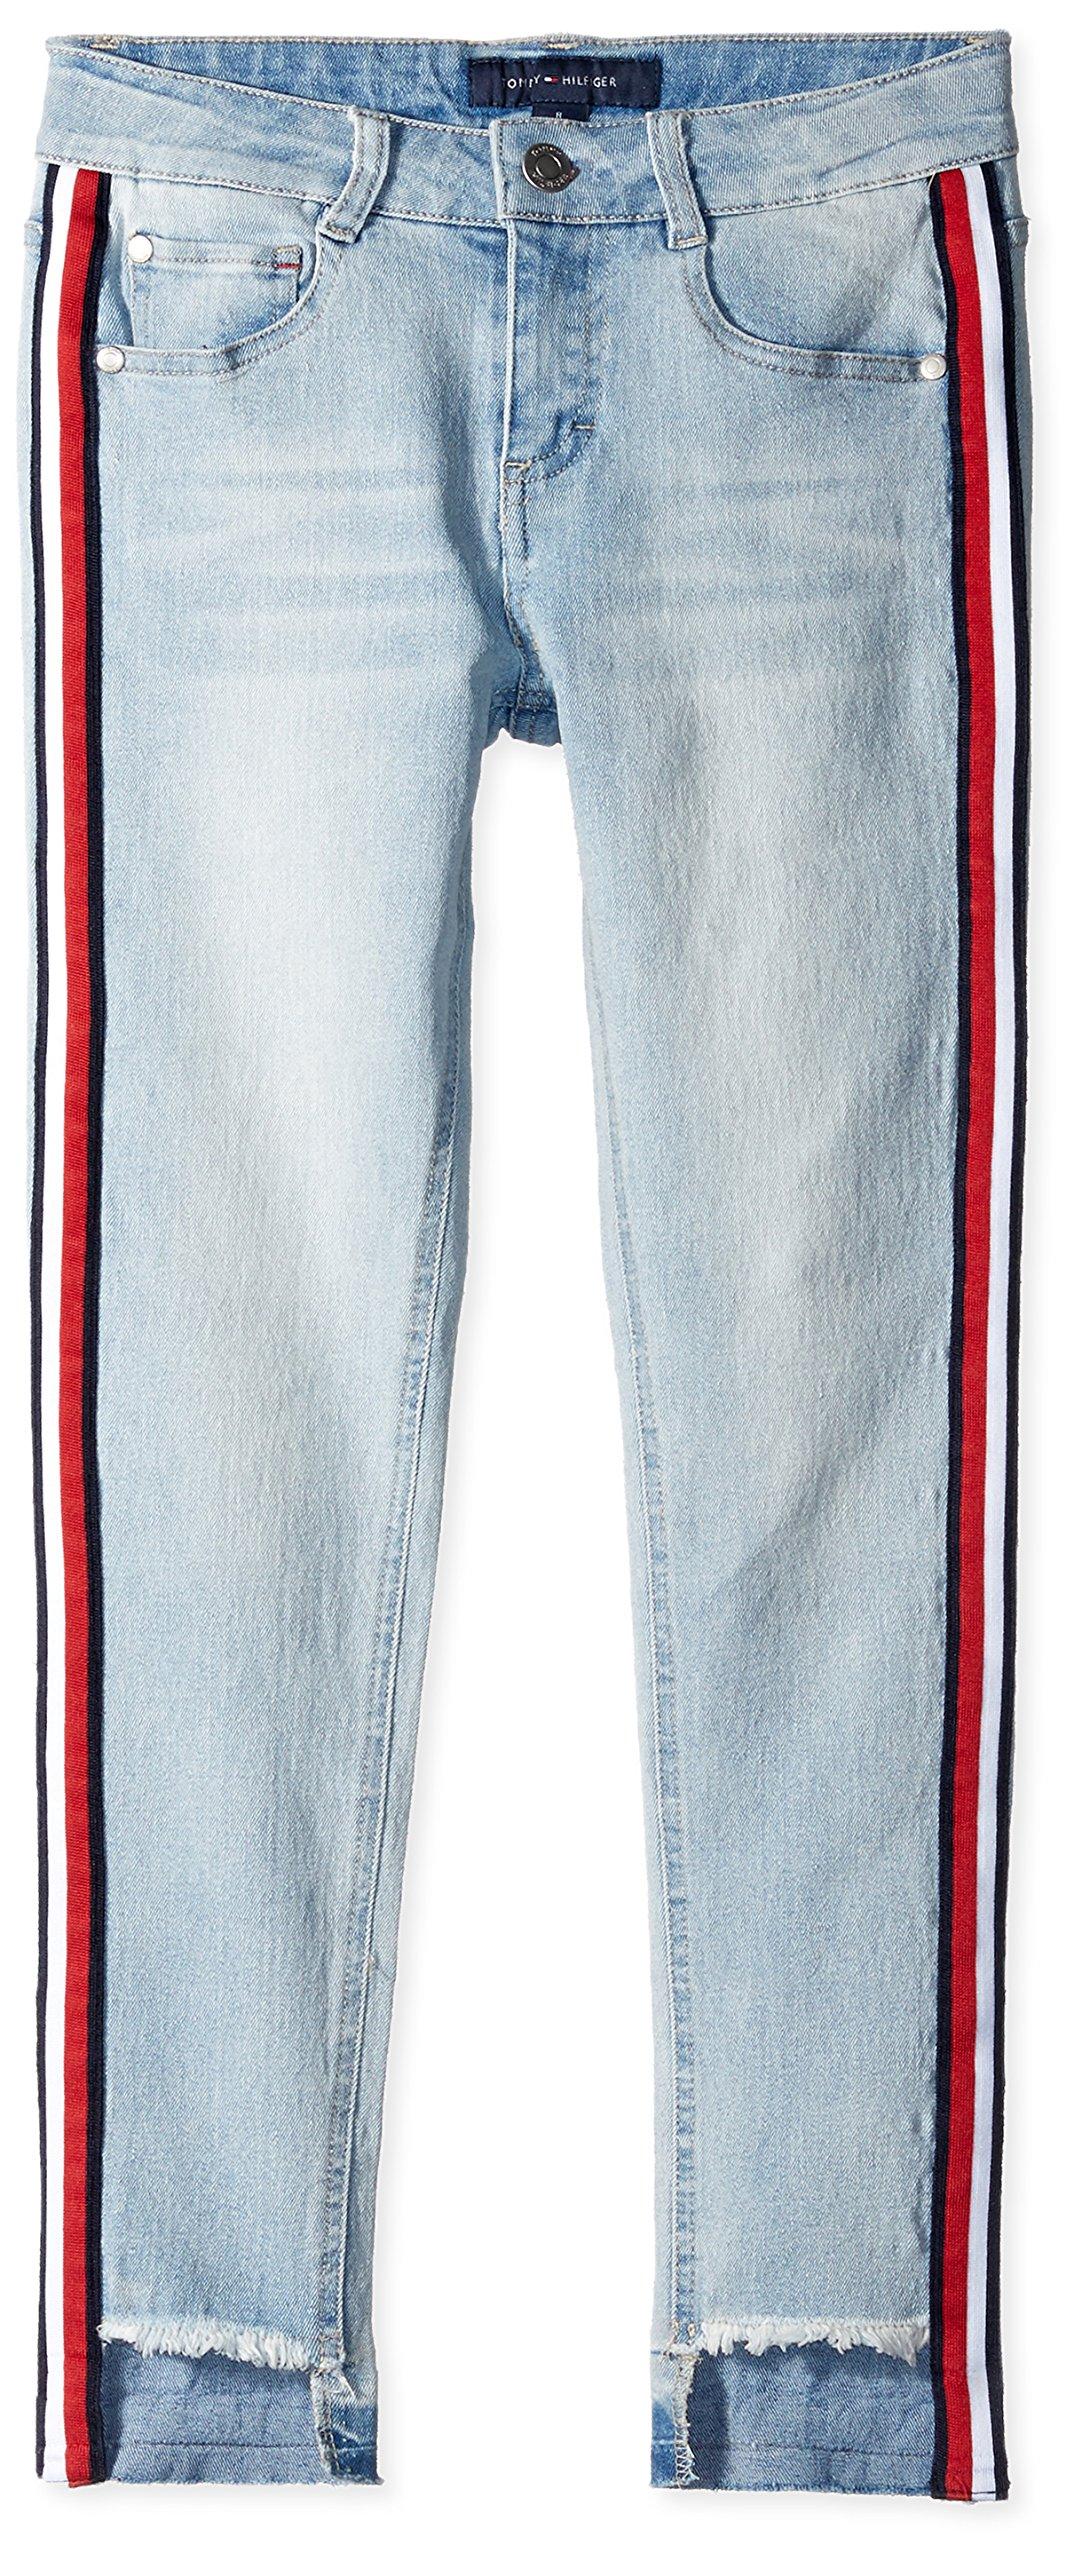 Tommy Hilfiger Girls' Big Stretch Denim Jean, 479 Chelsea WASH, 10